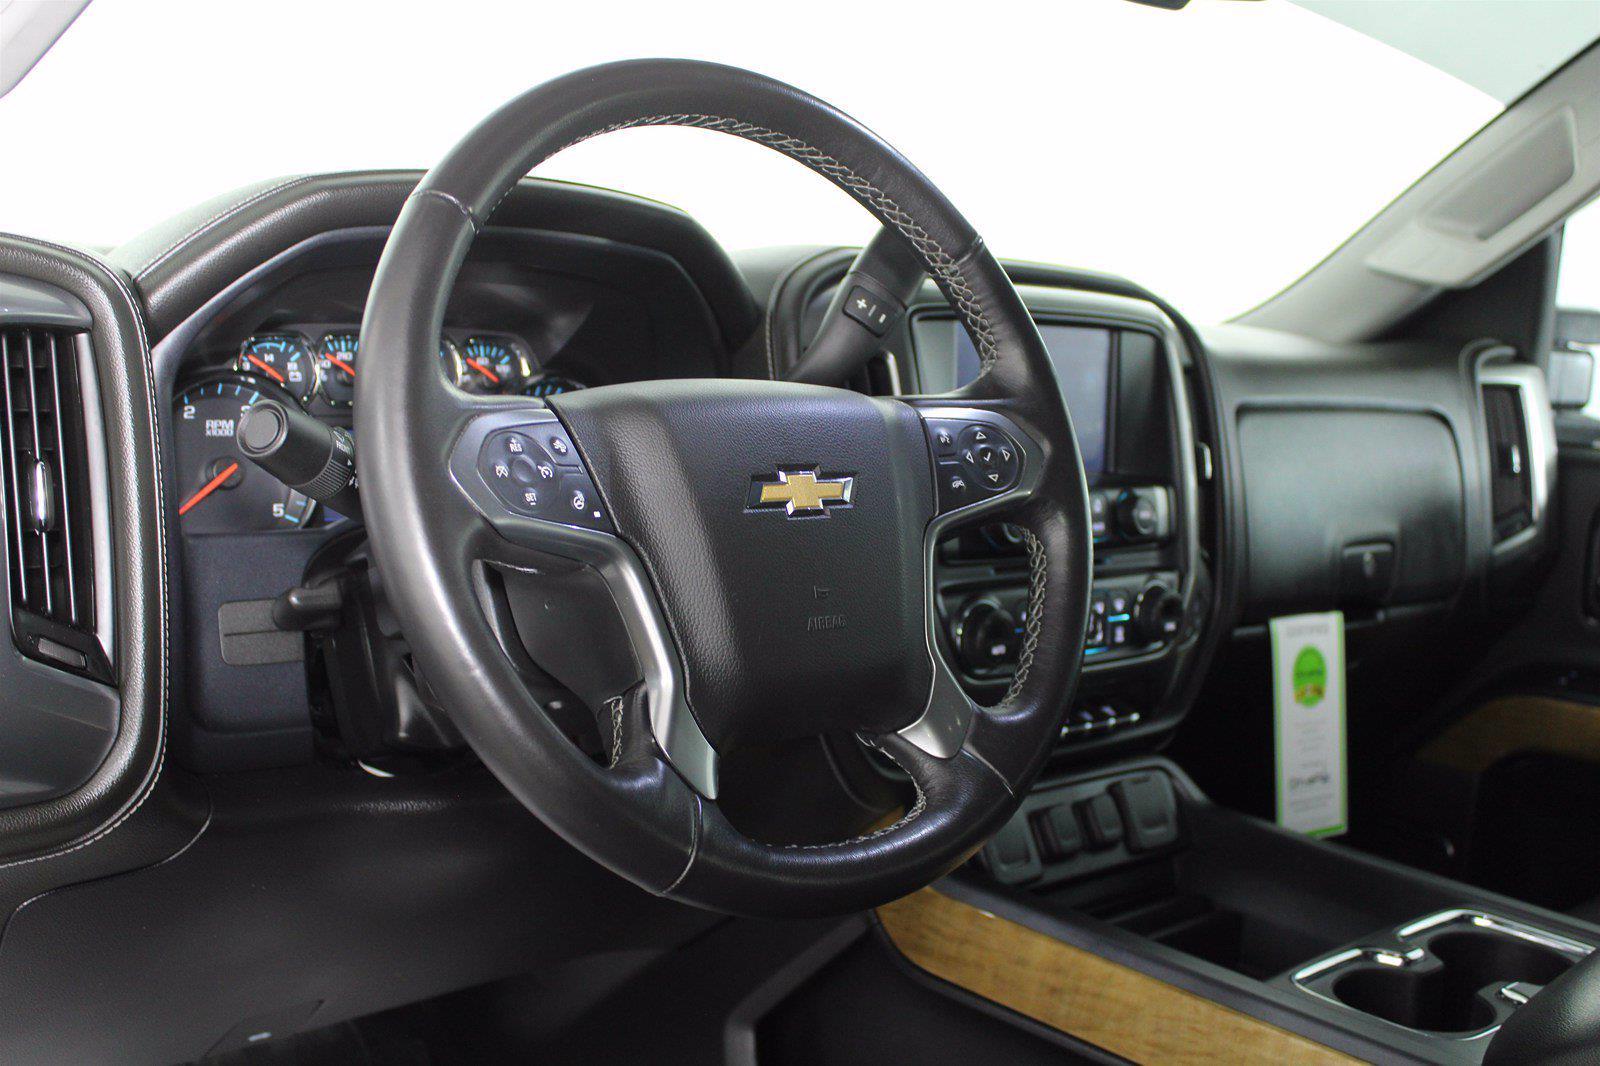 2016 Chevrolet Silverado 2500 Crew Cab 4x2, Pickup #D110630A - photo 4